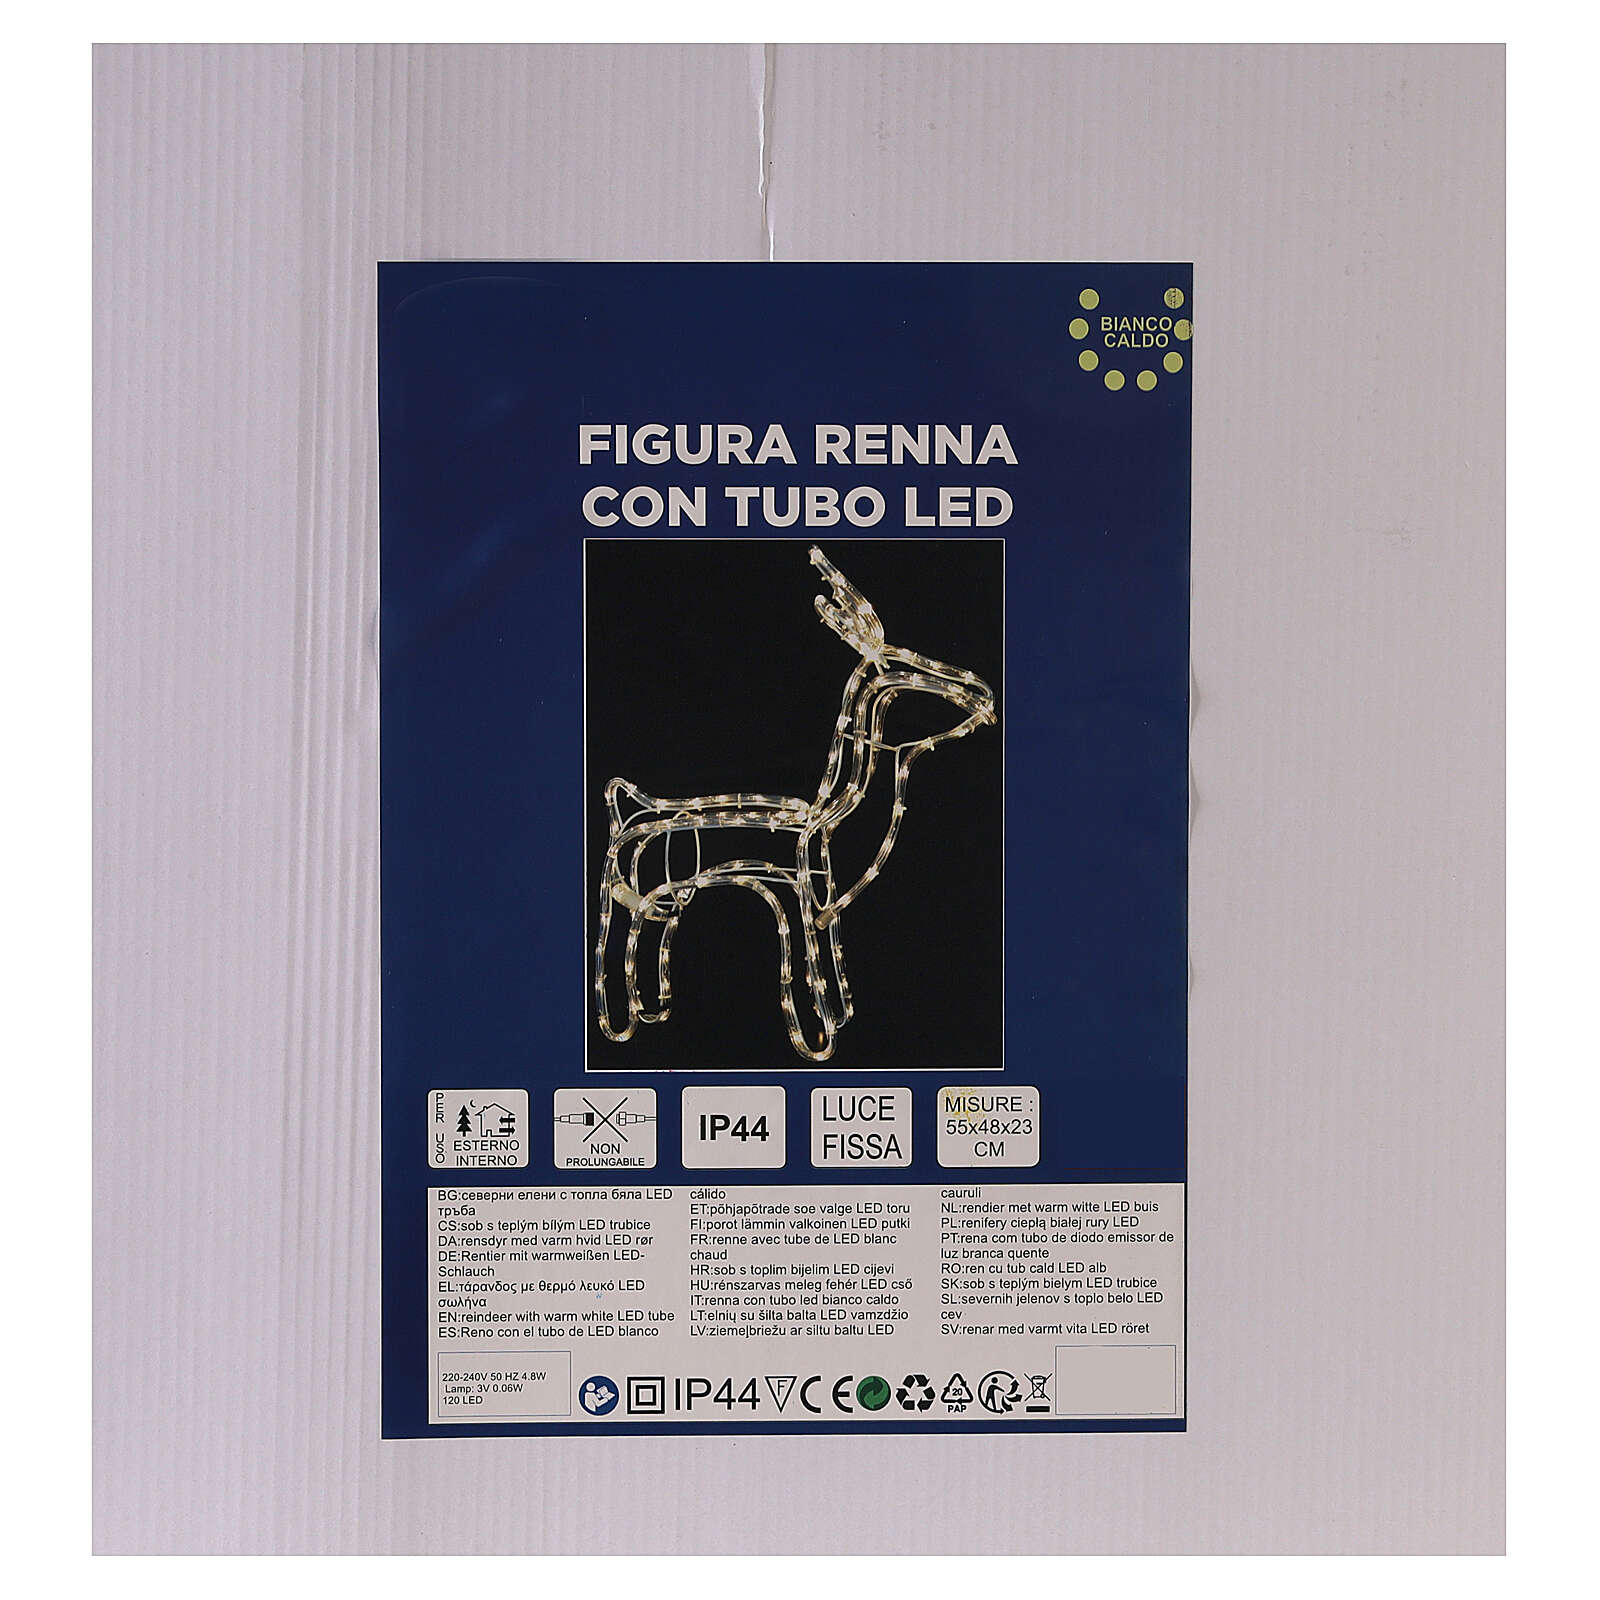 Renna luminosa tubo led bianco caldo 120 led h 55 cm corrente ESTERNO 3